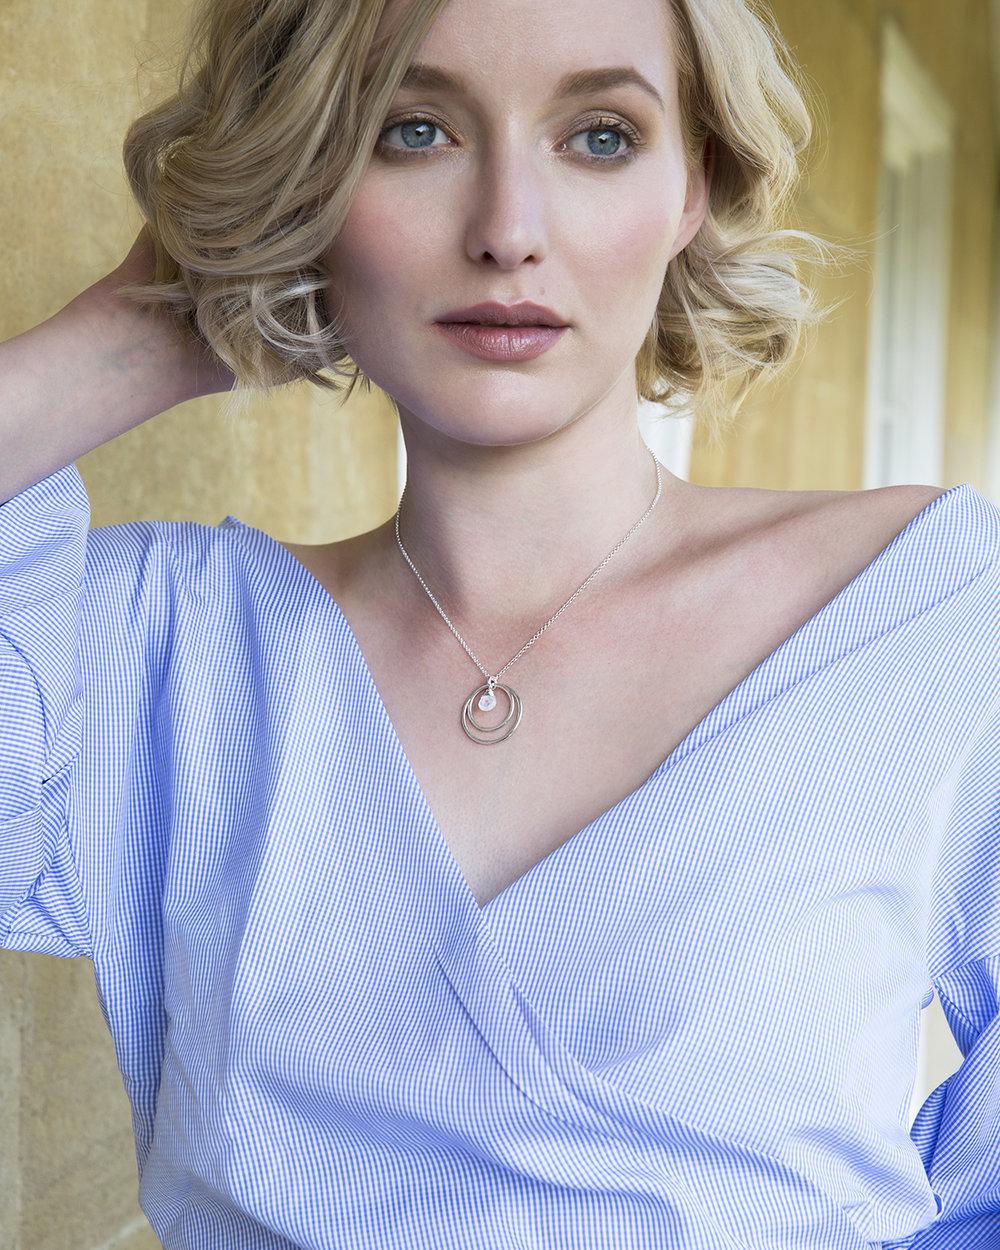 HoneyWillow     Photographer: Egle Vasi  Hair and Makeup : Daniela Renee     Model   Emily Lune